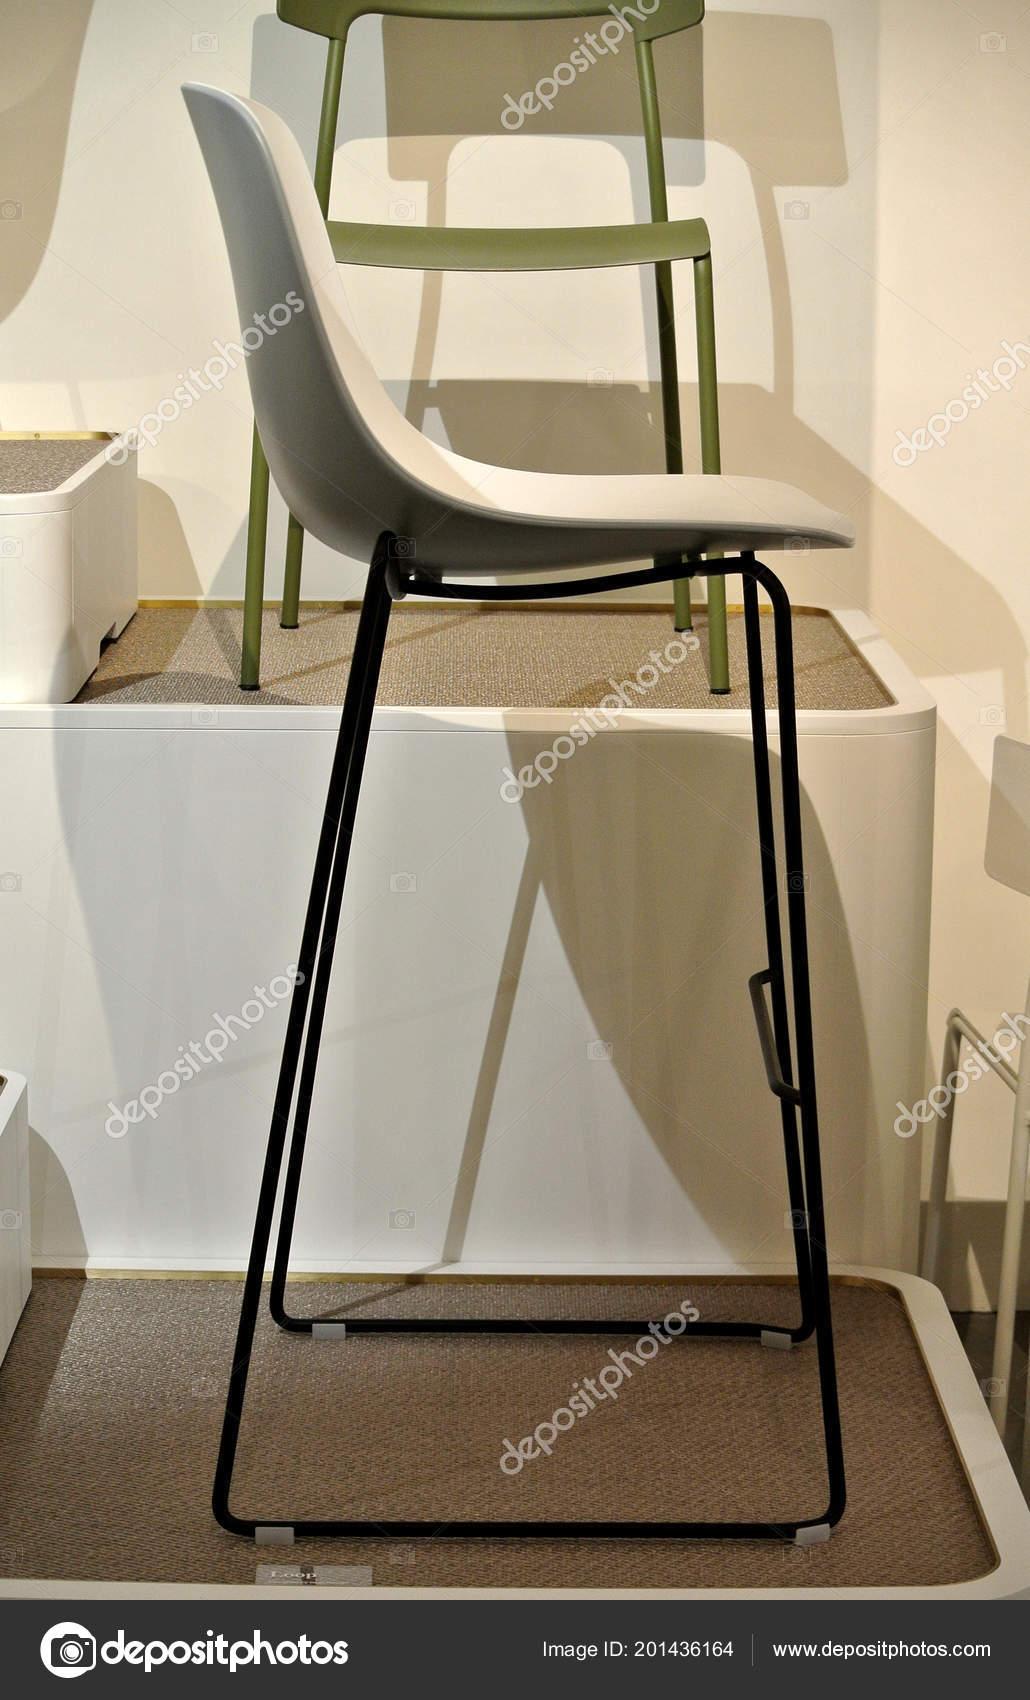 Sedie Di Plastica Colorate.Sedie Plastica Bianche Colorate Foto Stock